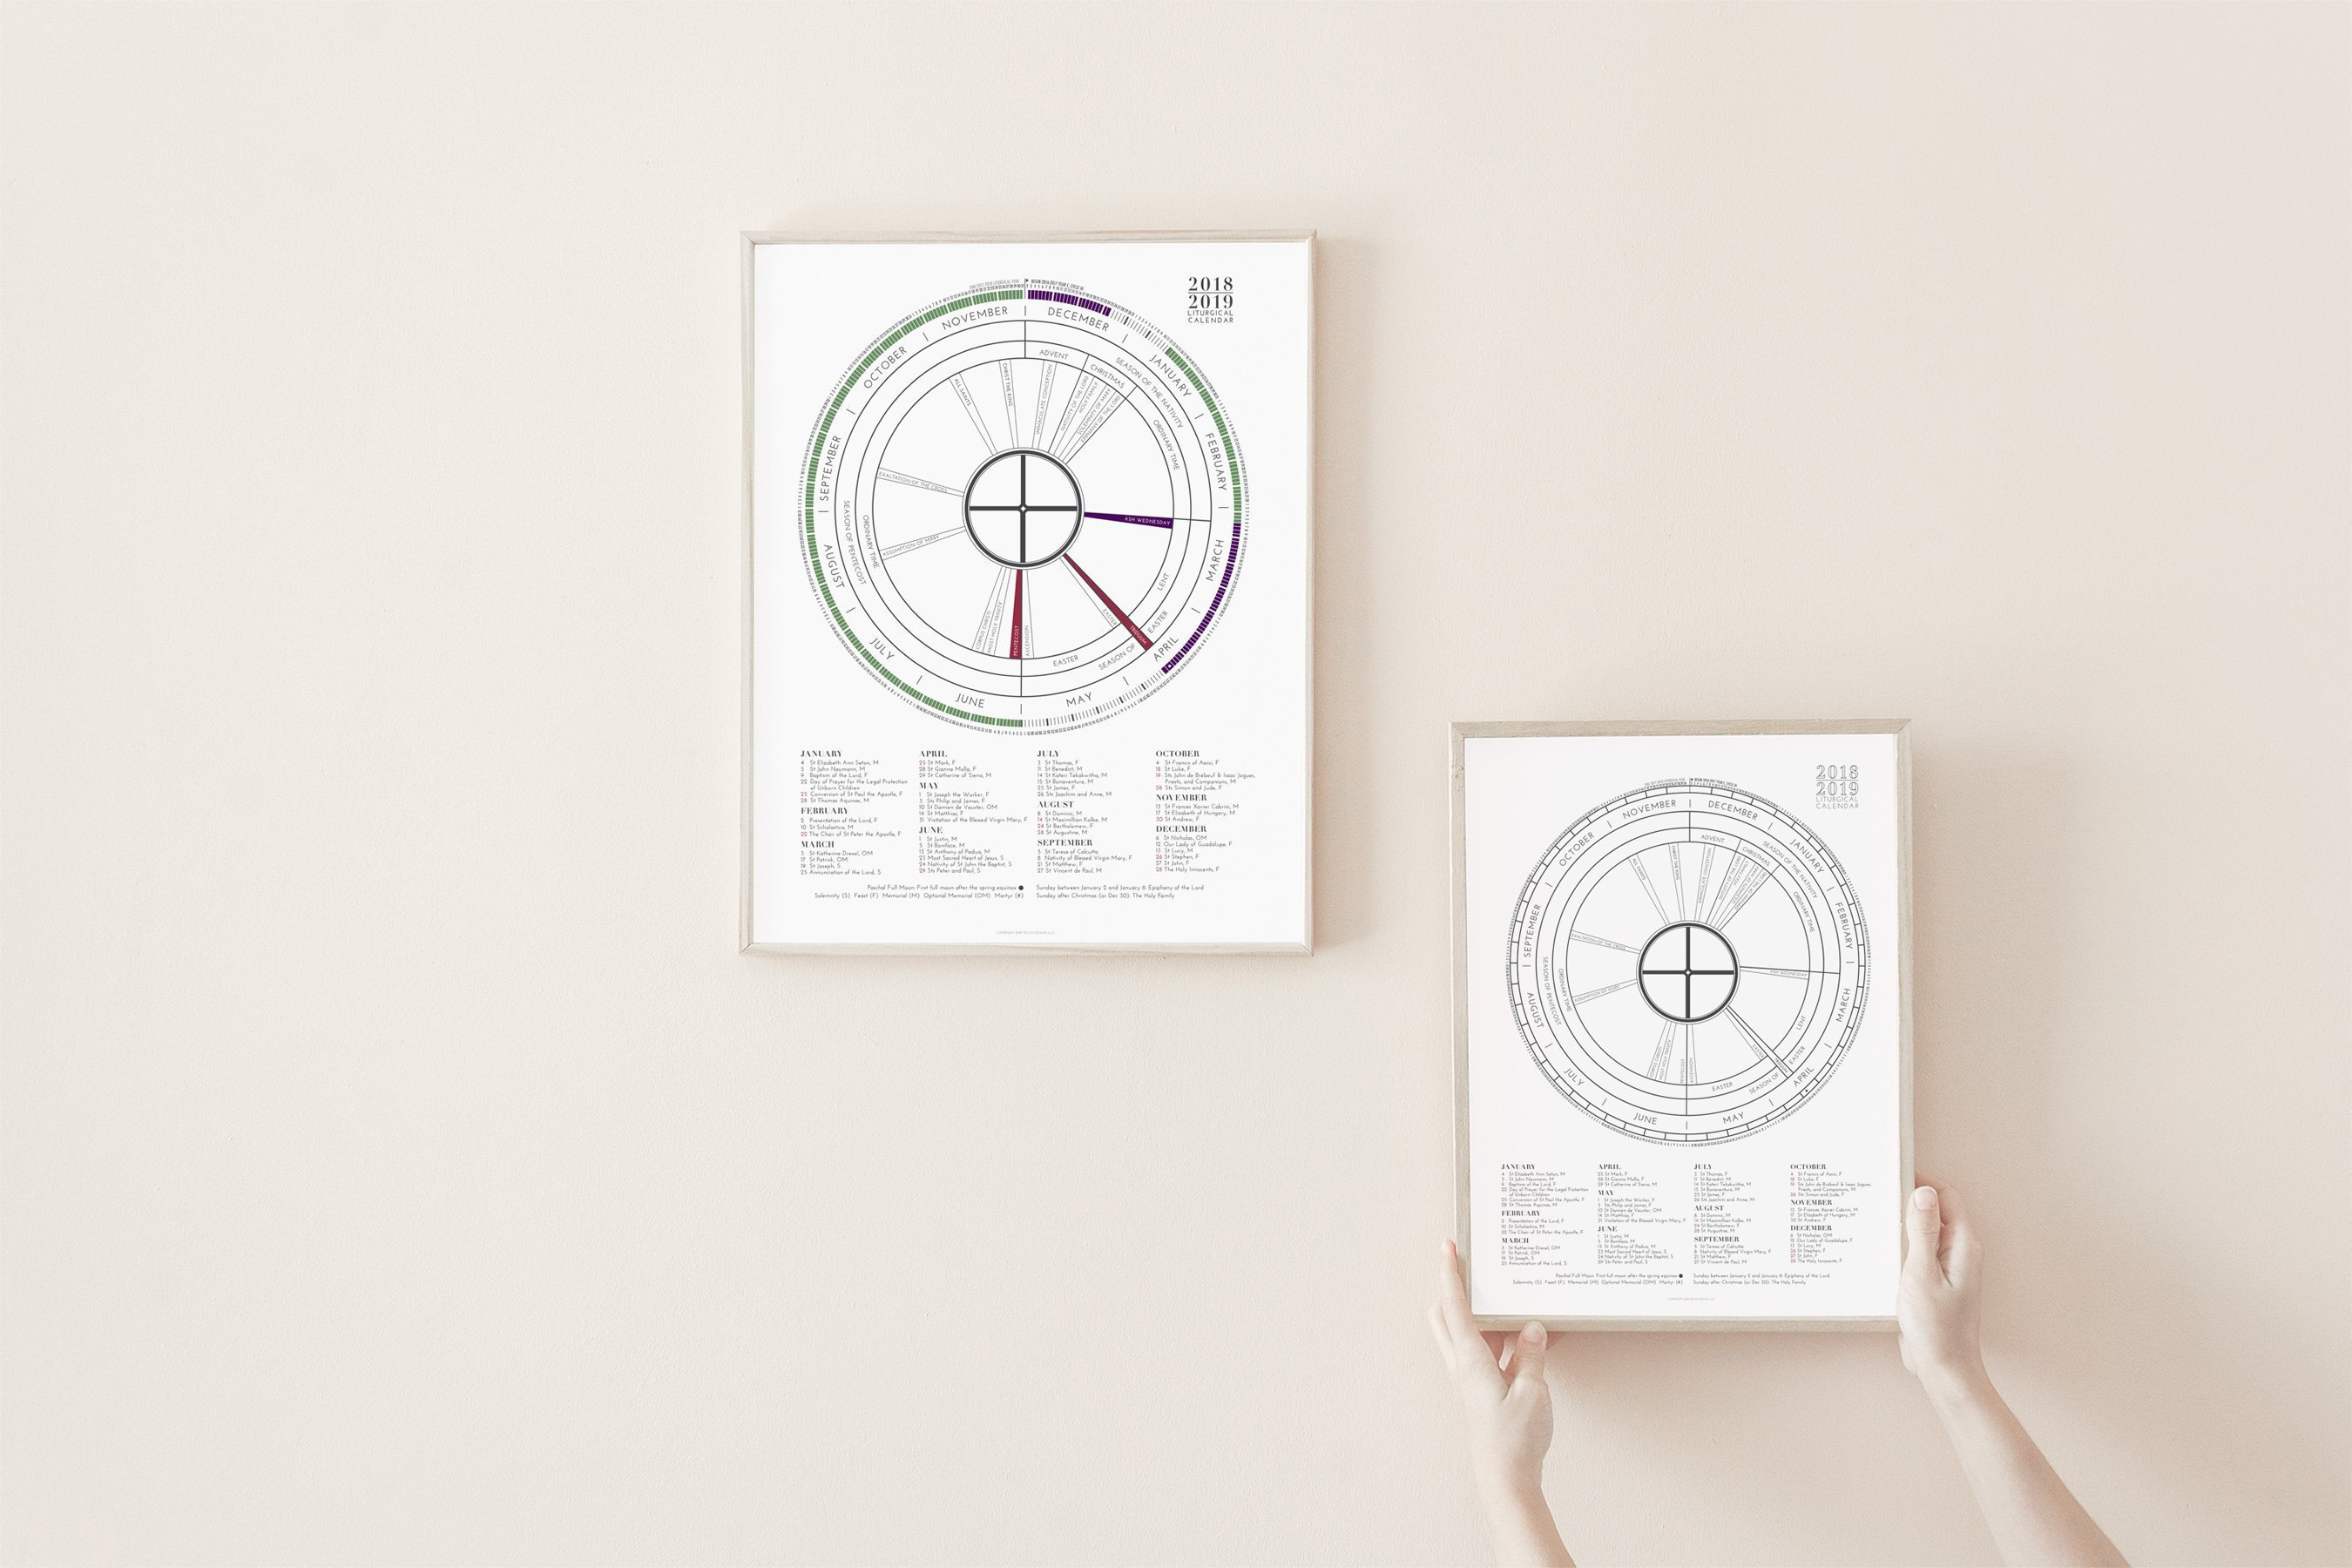 2019 Liturgical Calendar Bulk Pricing Gift For Baptism | Etsy Calendar 2019 Bulk